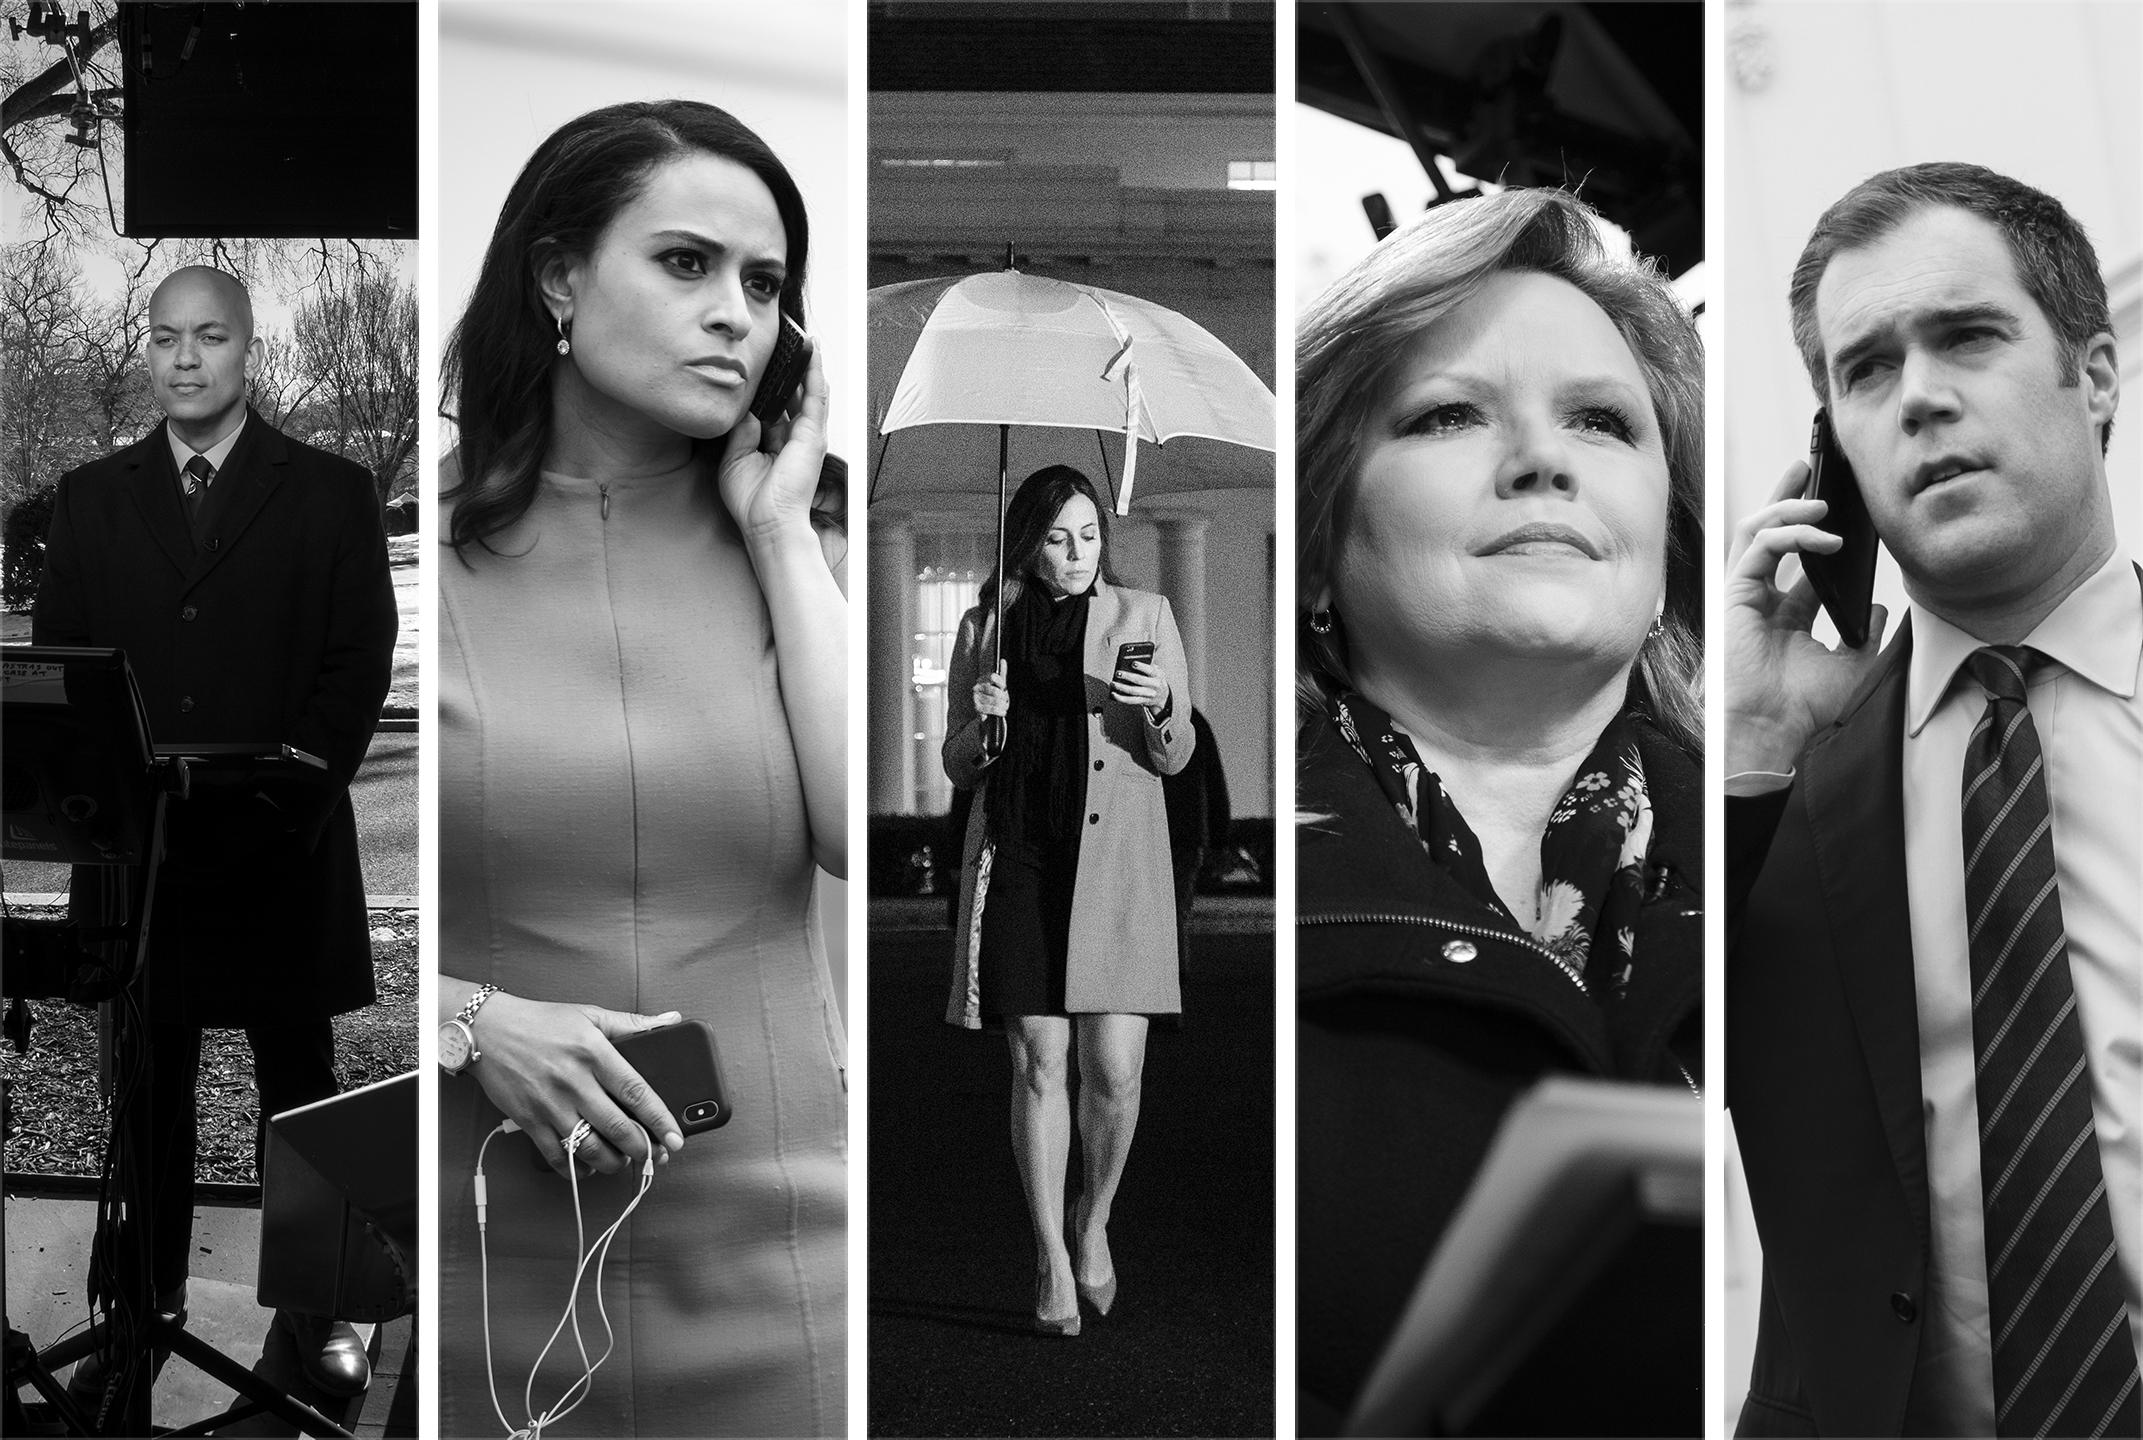 From left: NBC White House correspondents Geoff Bennett, Kristen Welker, Hallie Jackson, Kelly O'Donnell and Peter Alexander.